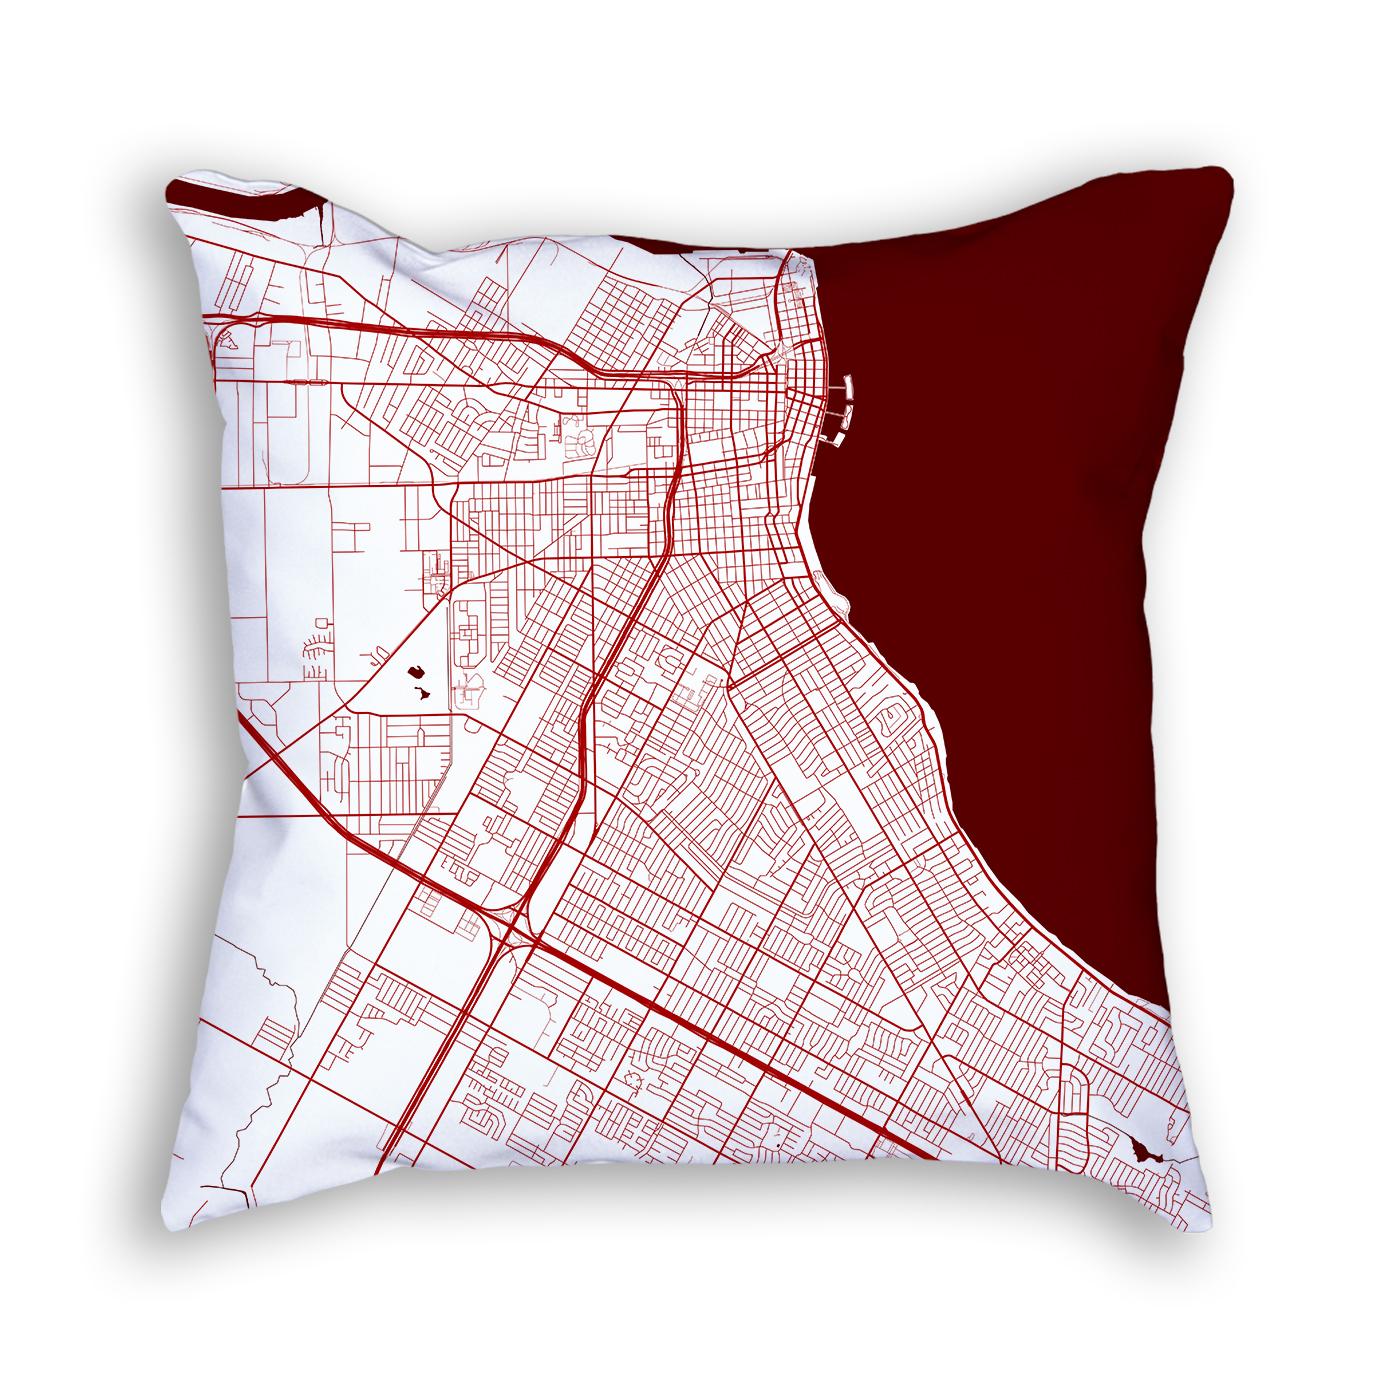 Corpus Christi Texas Throw Pillow – City Map Decor - Texas Map Pillow